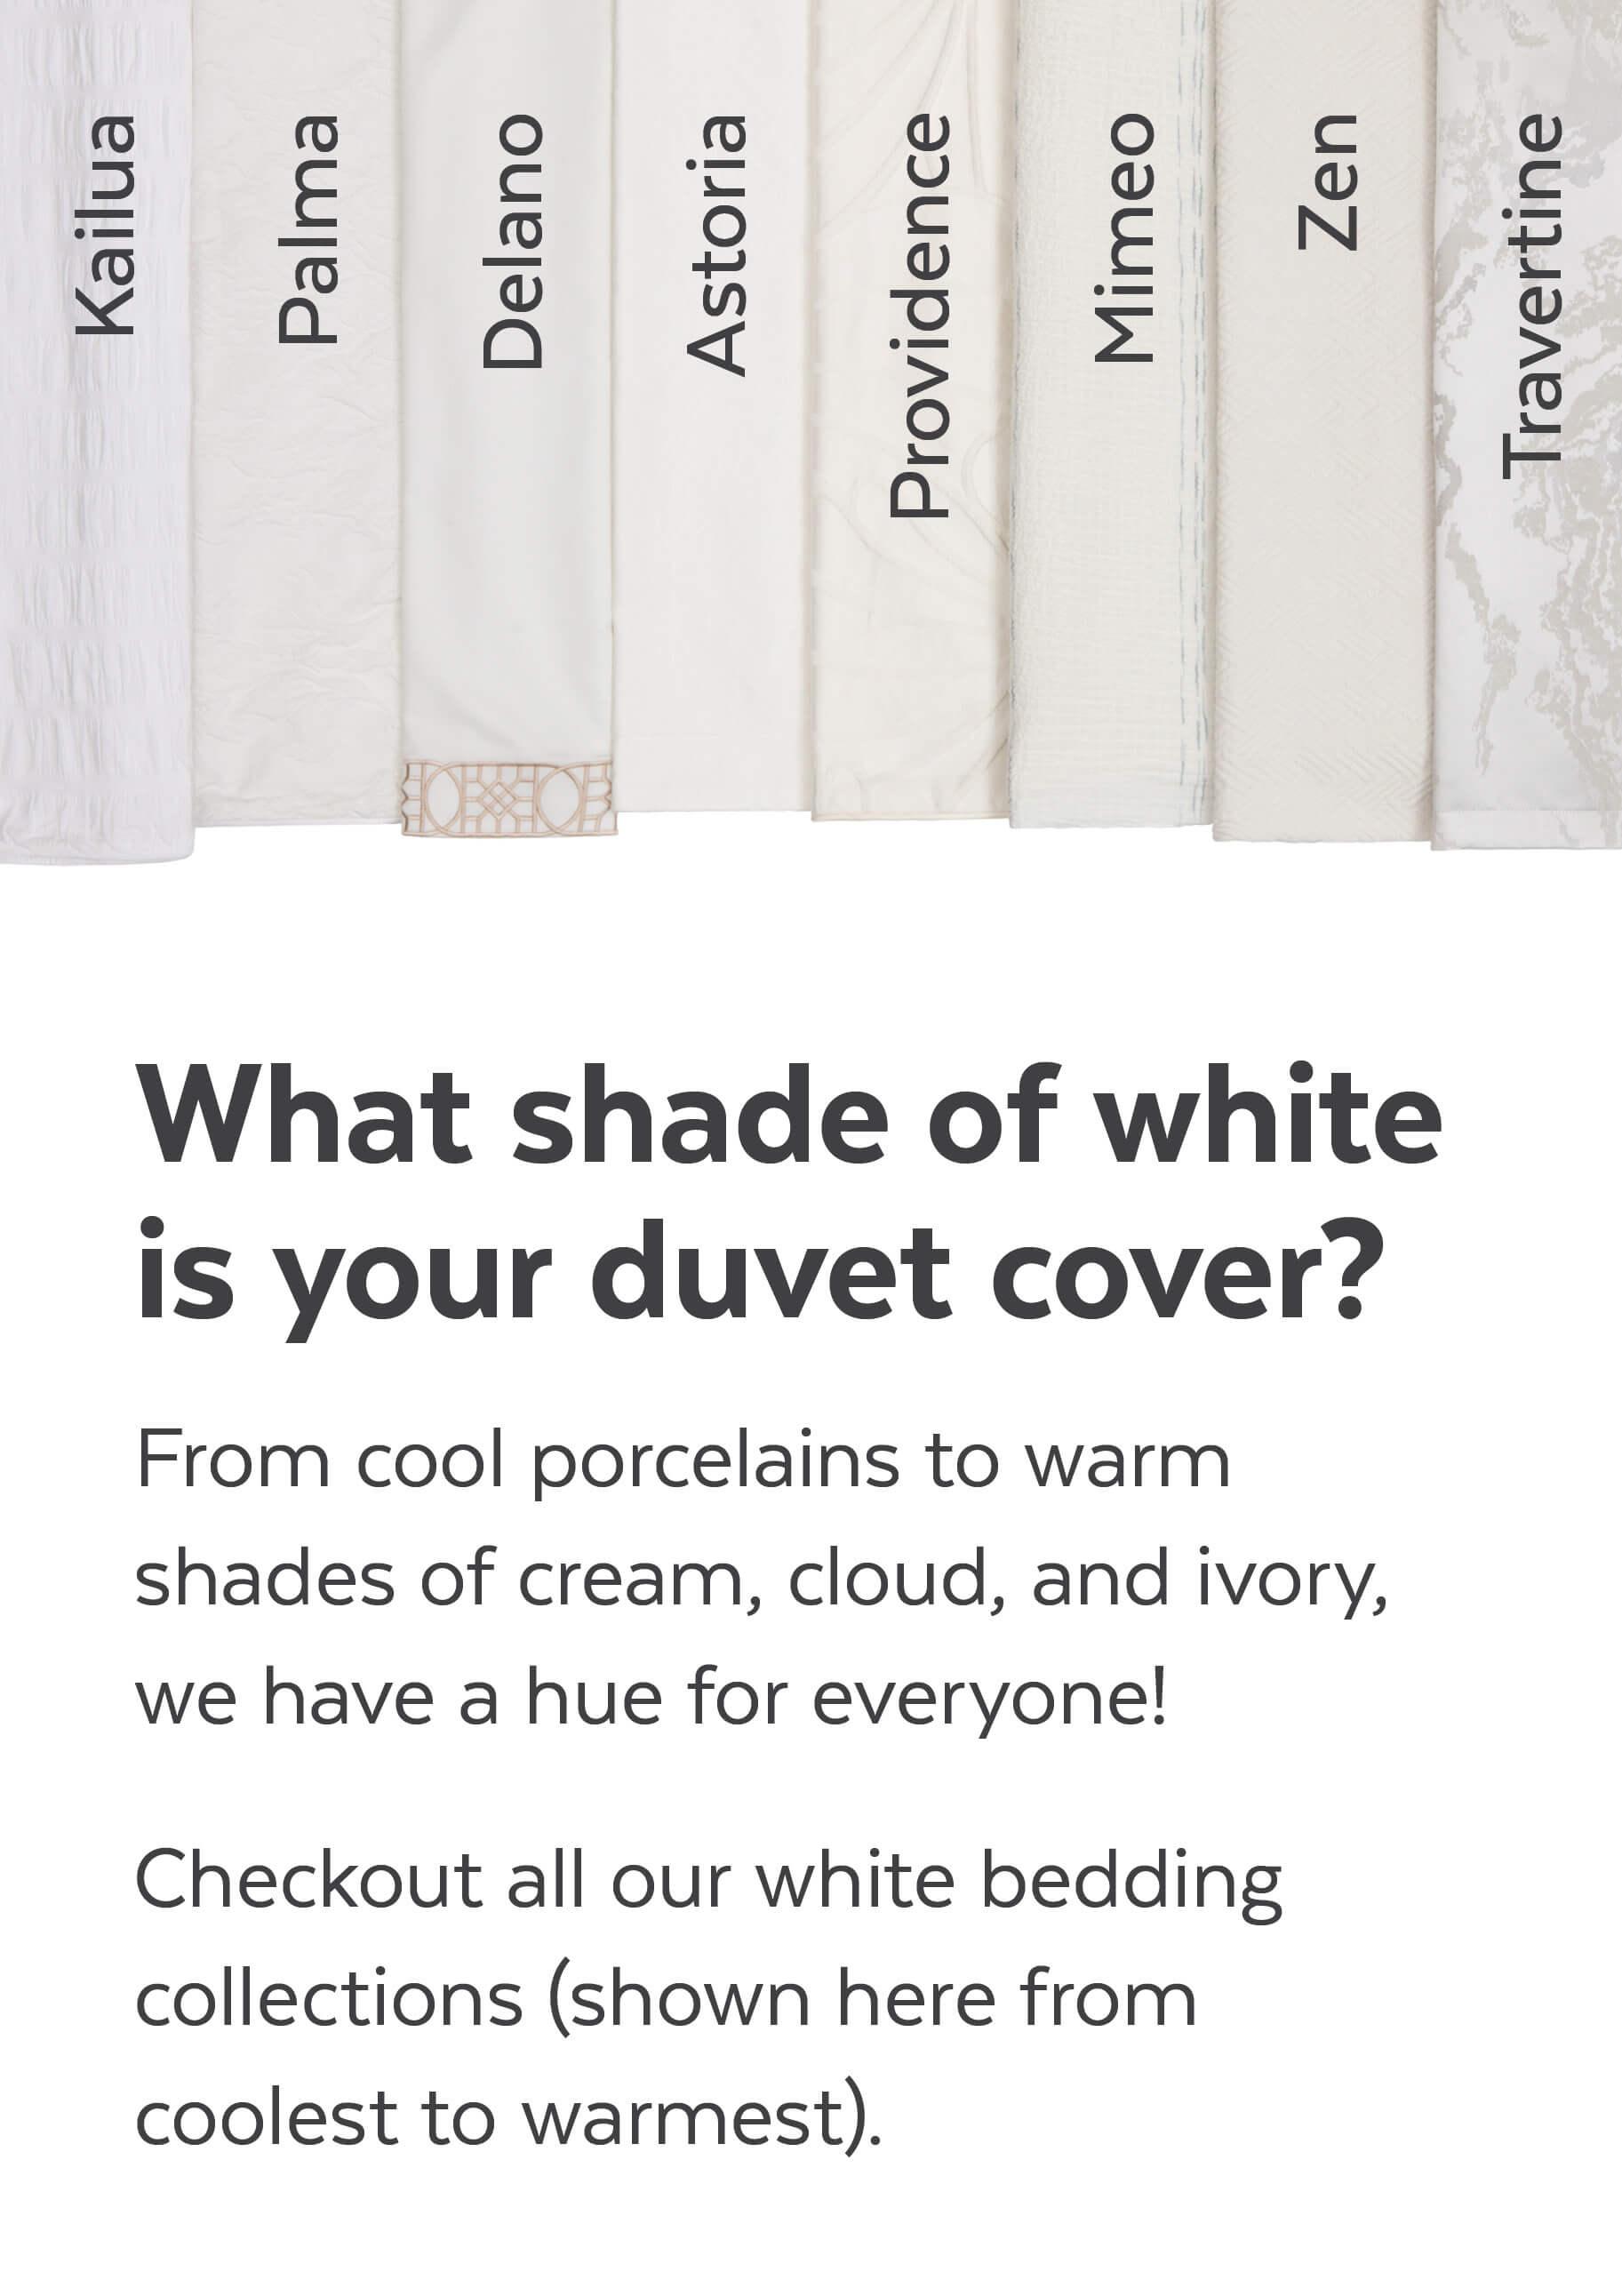 White bedding collections shown from coolest to warmest. Kailua, Palma, Delano, Astoria, Providence, Mimeo, Zen, Travertine.